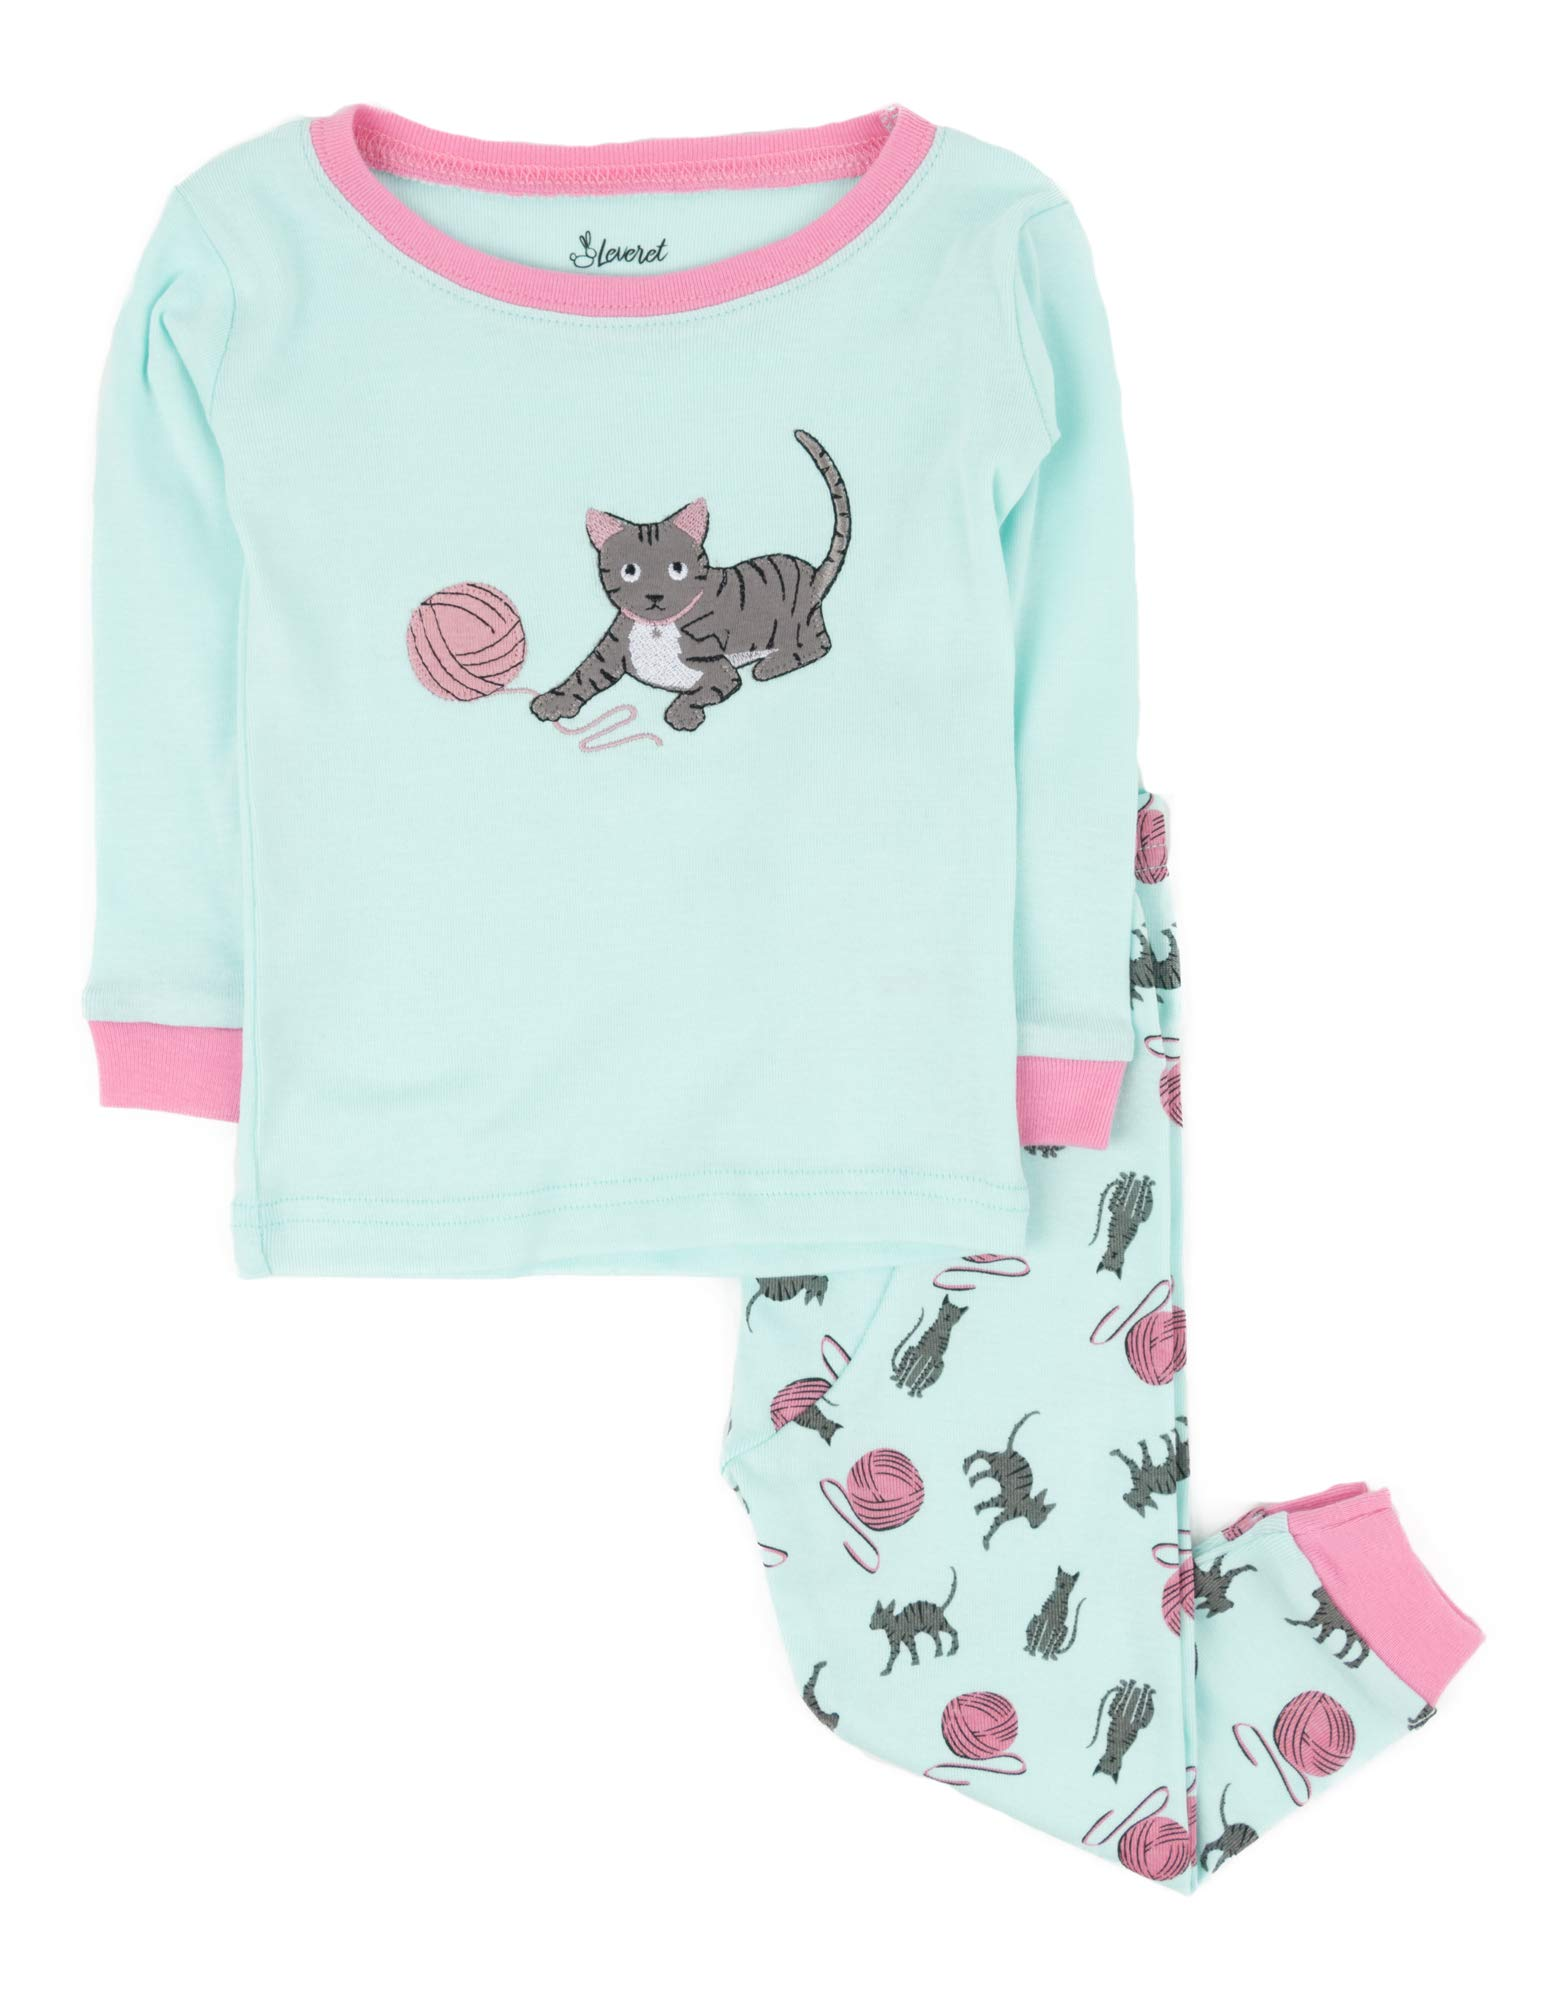 Size 2 Toddler -10Y Leveret Girls Shorts Rainbow 2 Piece Pajama 100/% Cotton